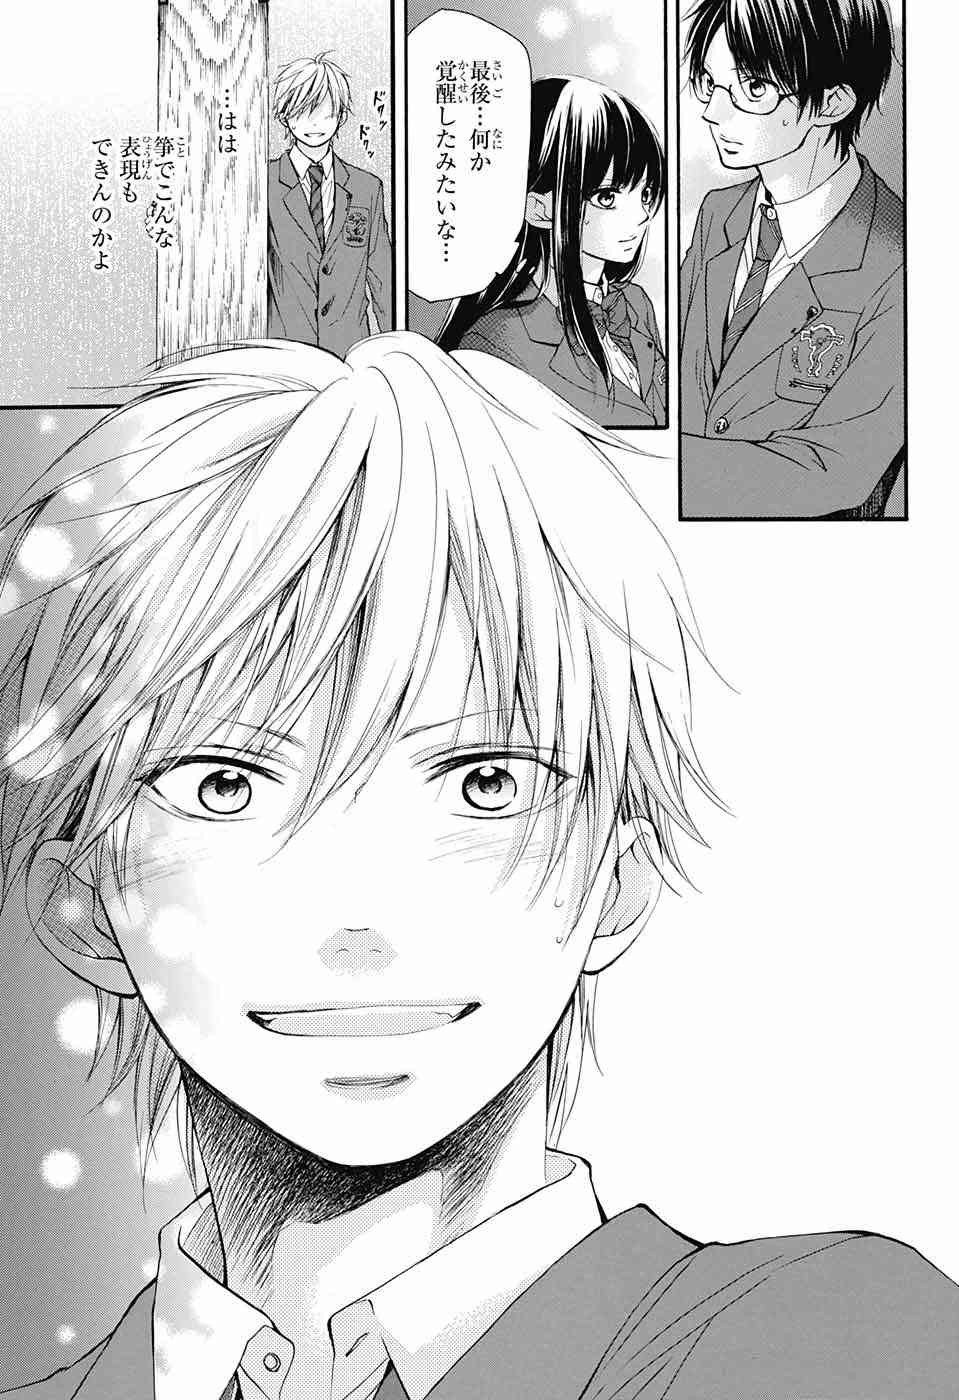 Kono Oto Tomare! - Chapter 50 - Page 3